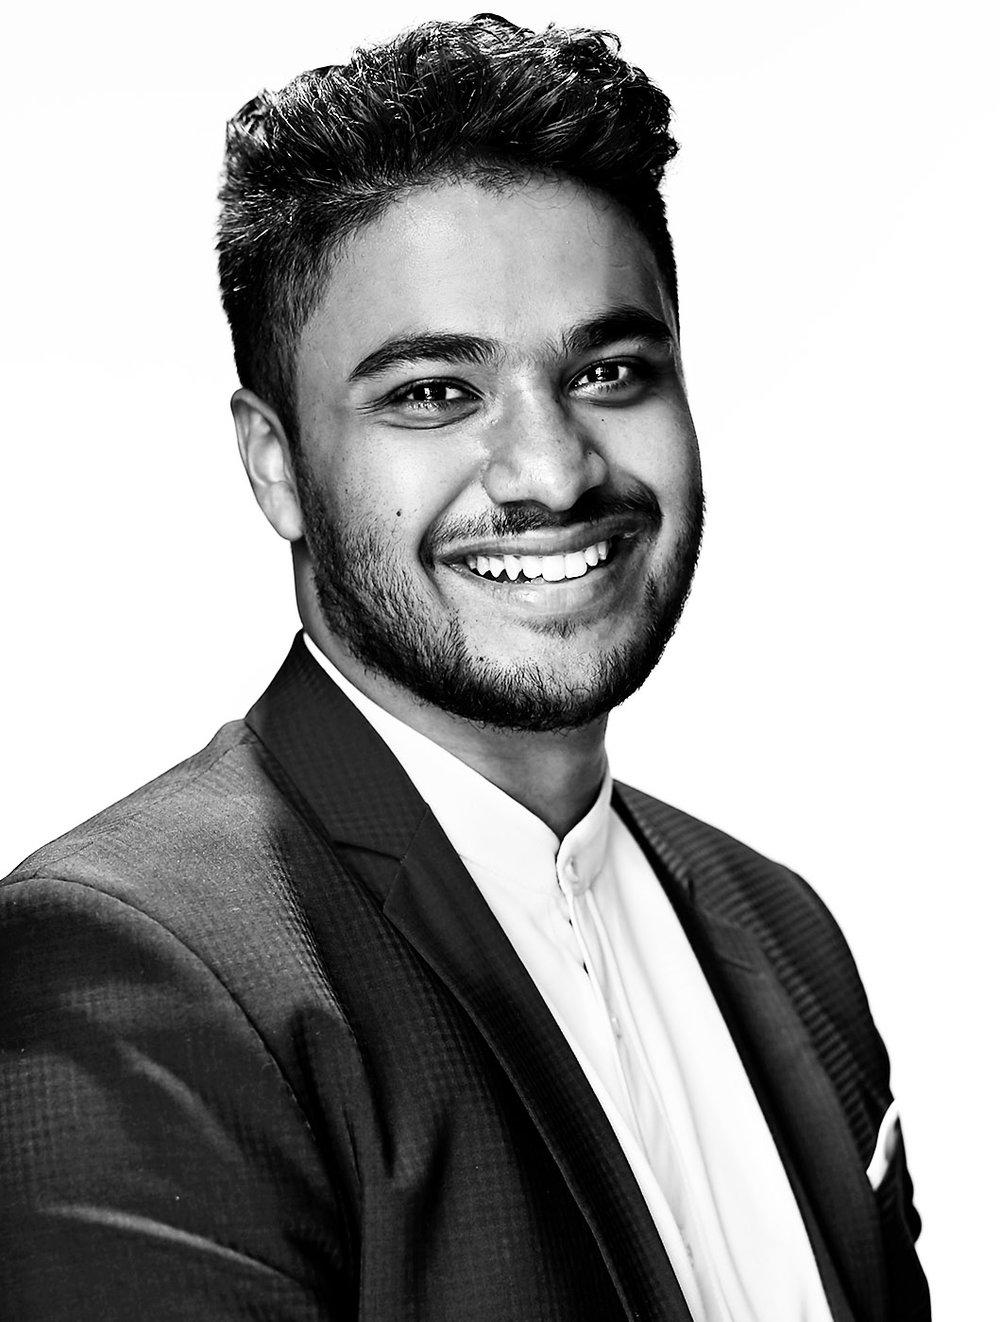 Diluckshan Jeyaratnam, musicalperformer